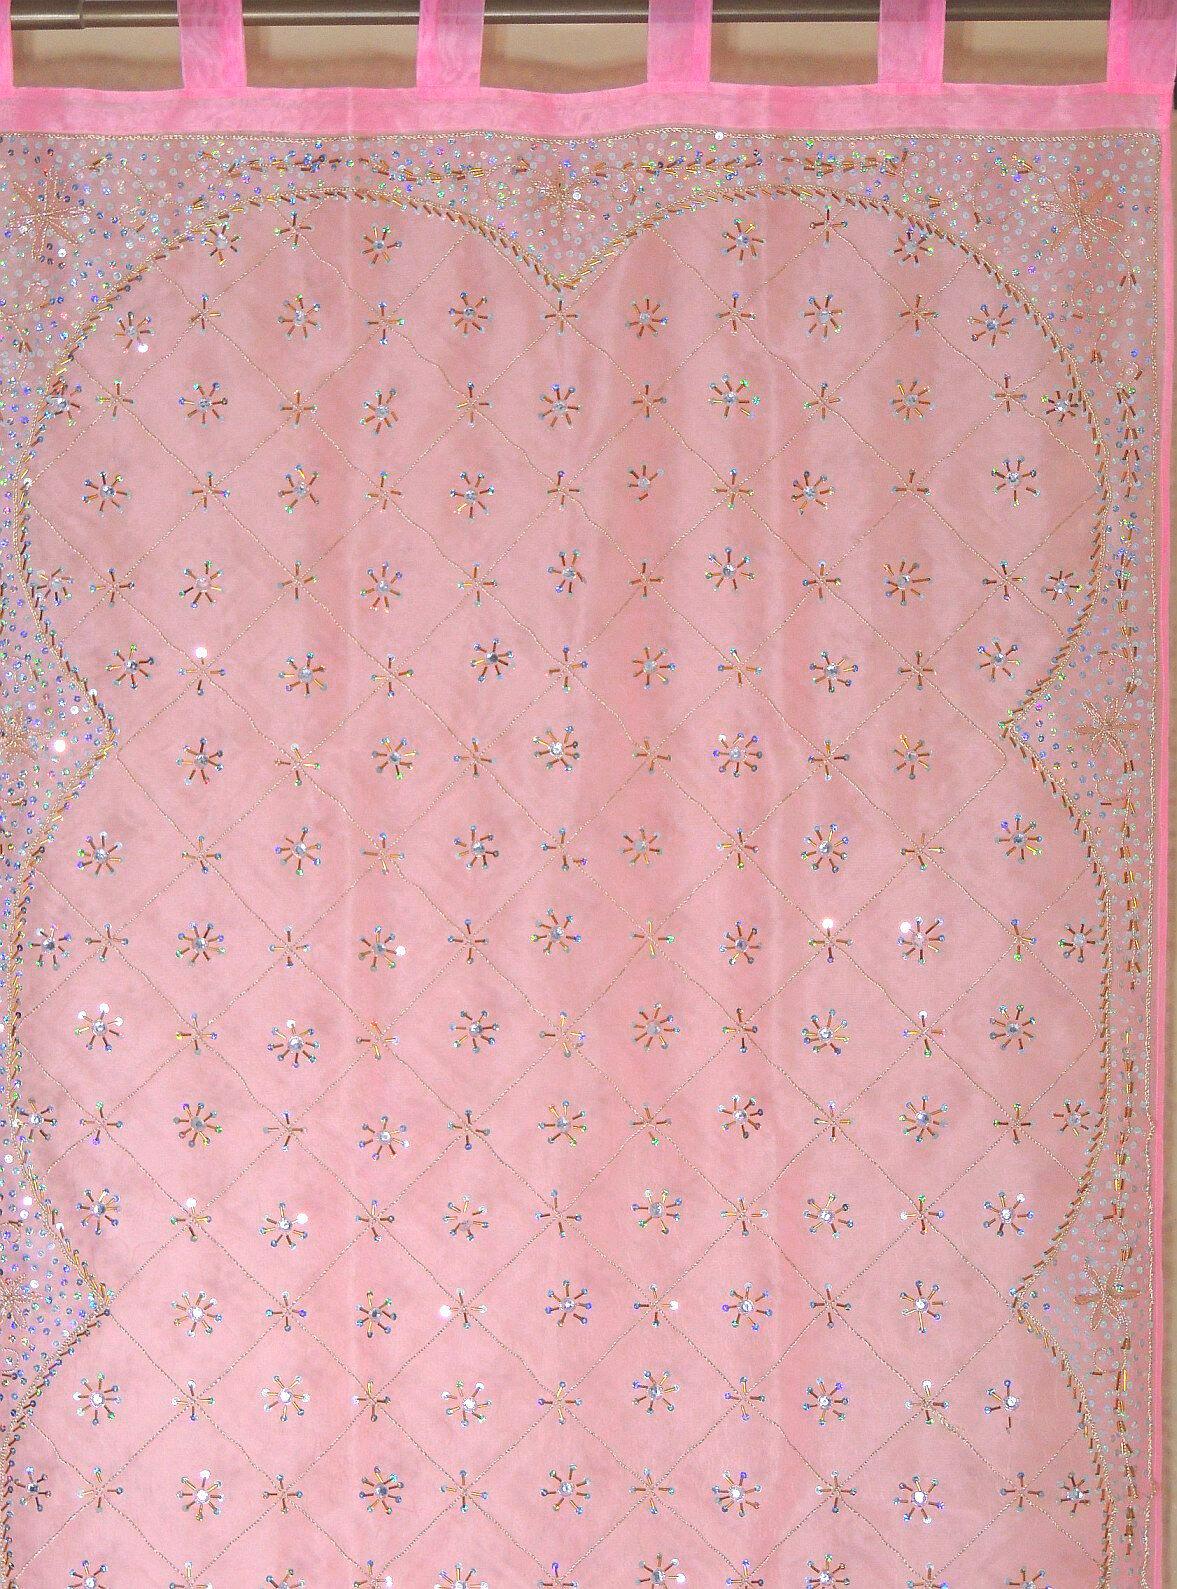 Rosa Curtain Panel - Zardozi Embroiderot Embroiderot Embroiderot Beaded India Window Treatments 92  2d0615